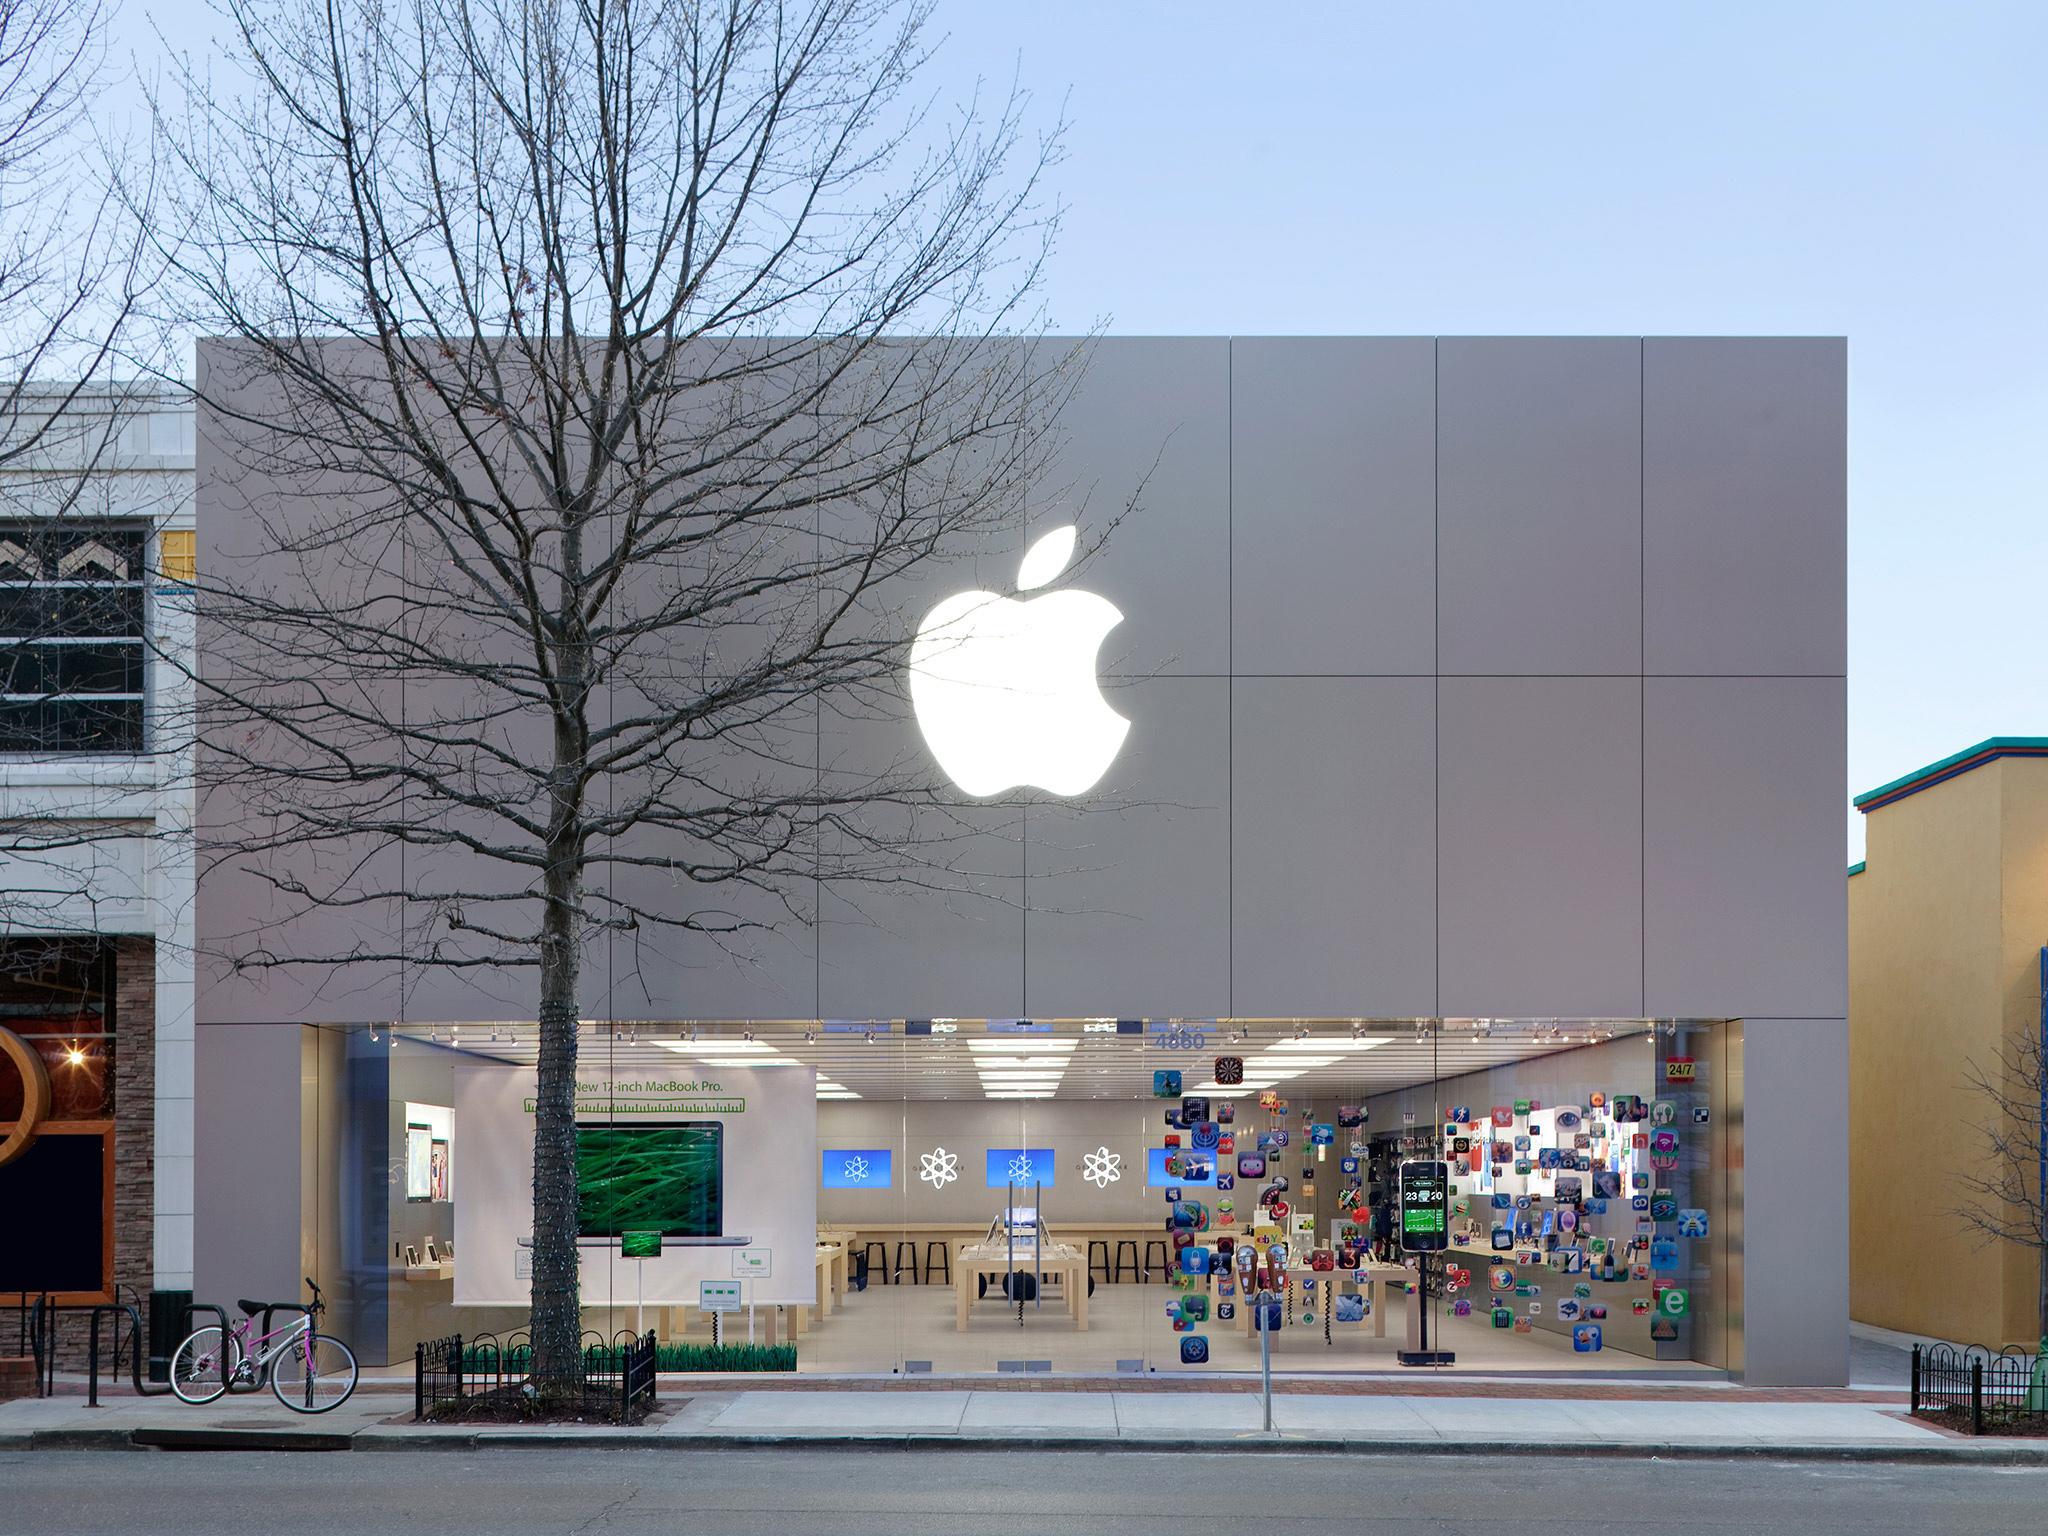 Apple Bethesda Row